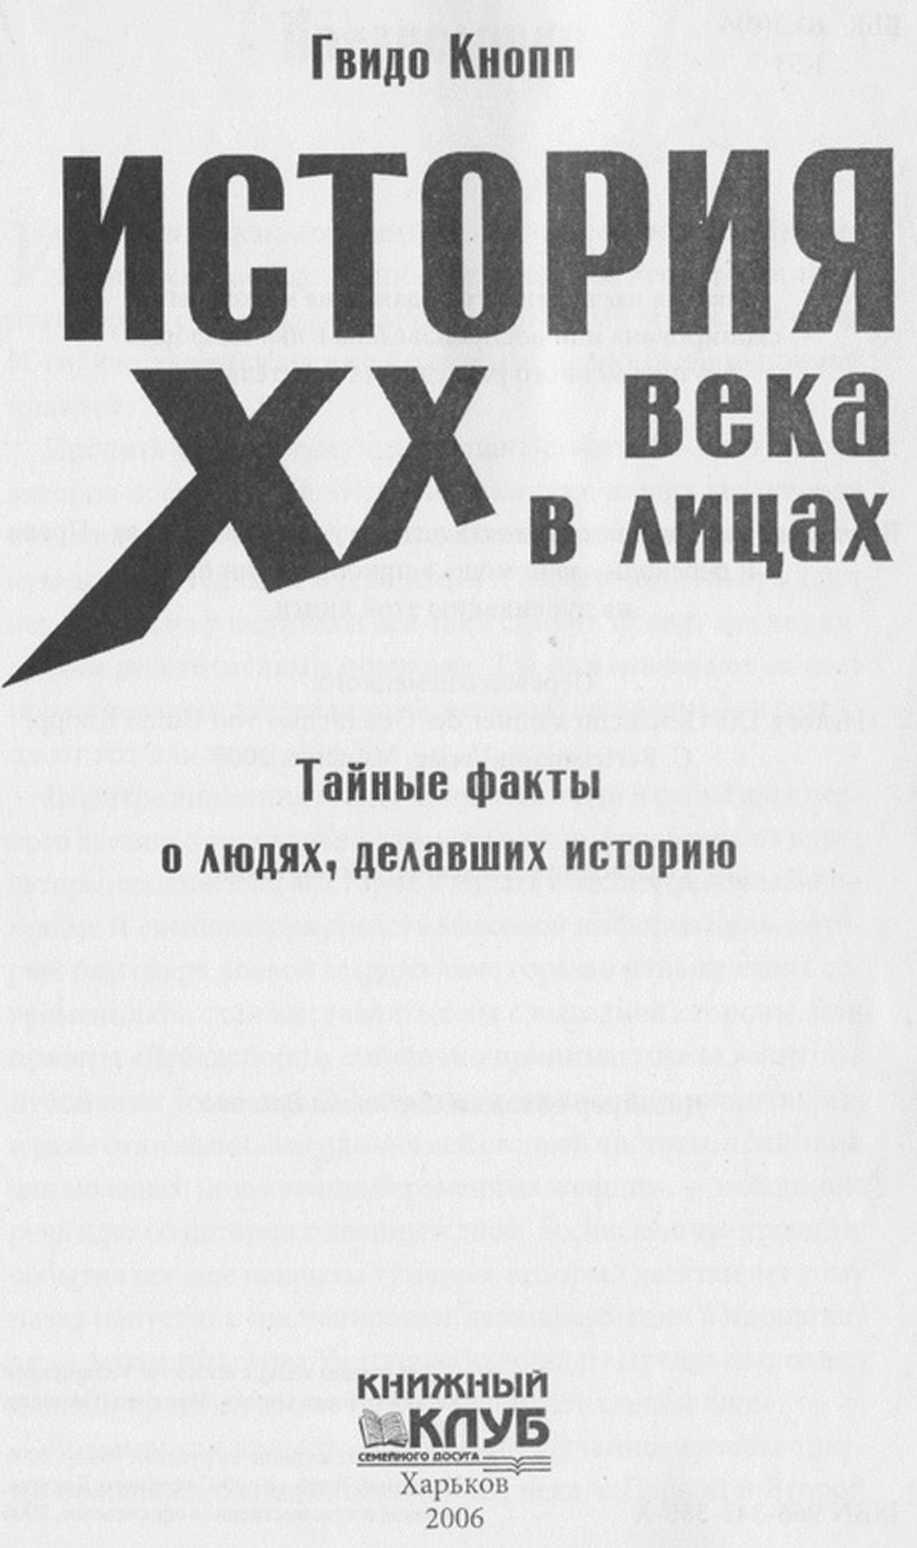 советская присяга текст